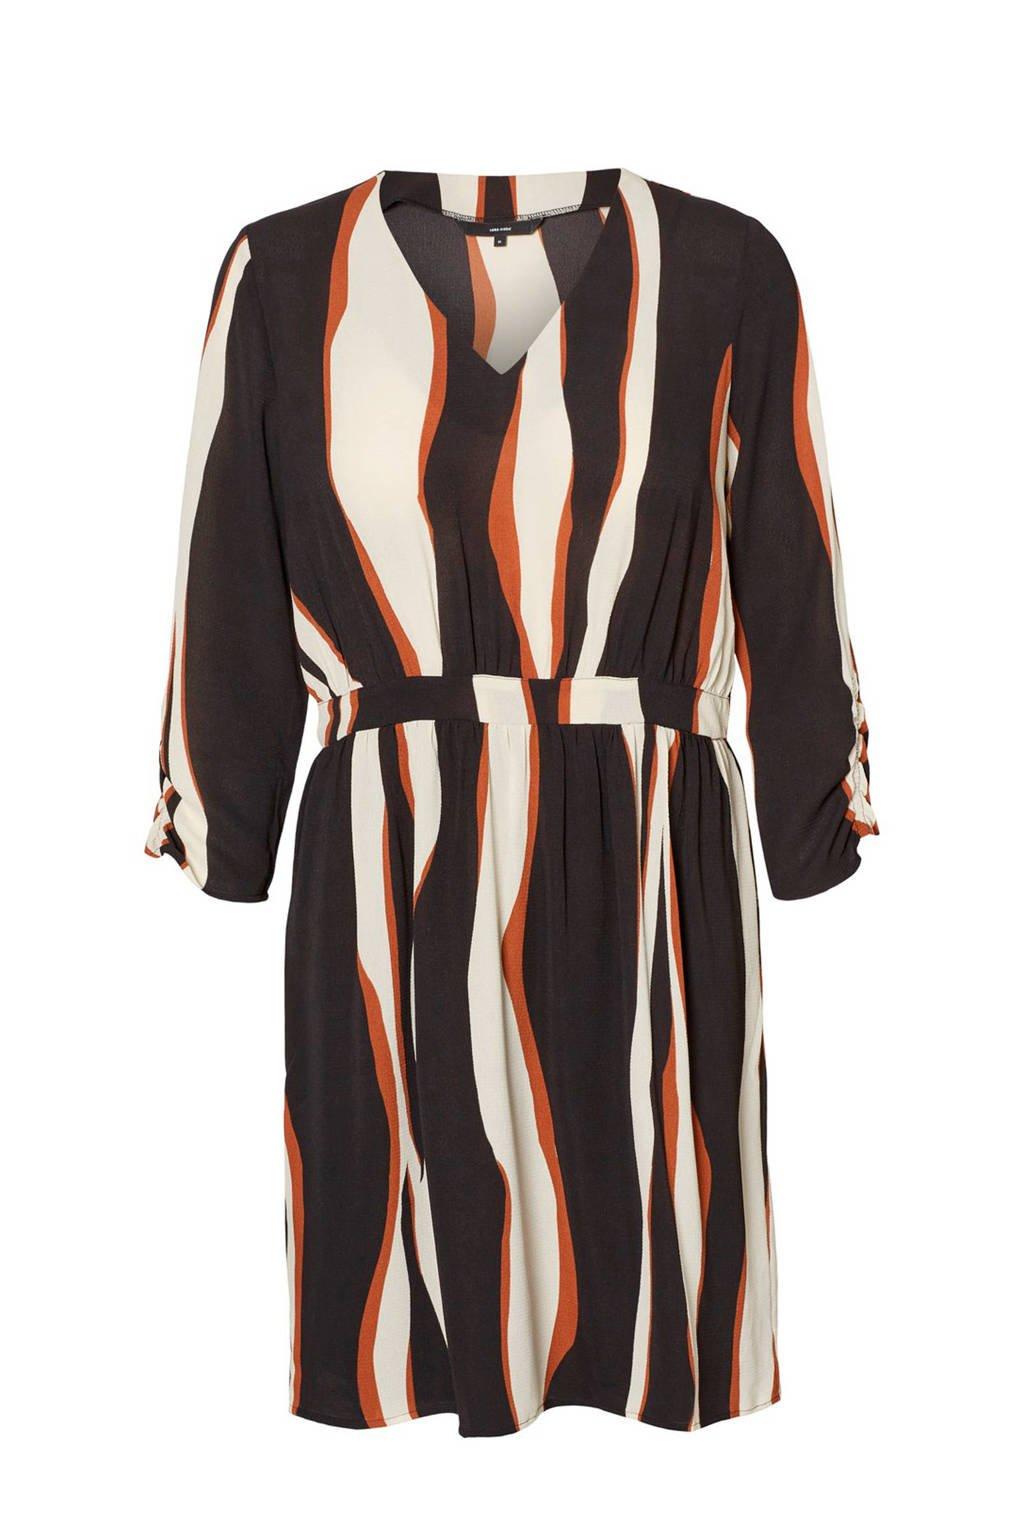 VERO MODA jurk met plooien zwart/crème/oranje, Zwart/crème/oranje